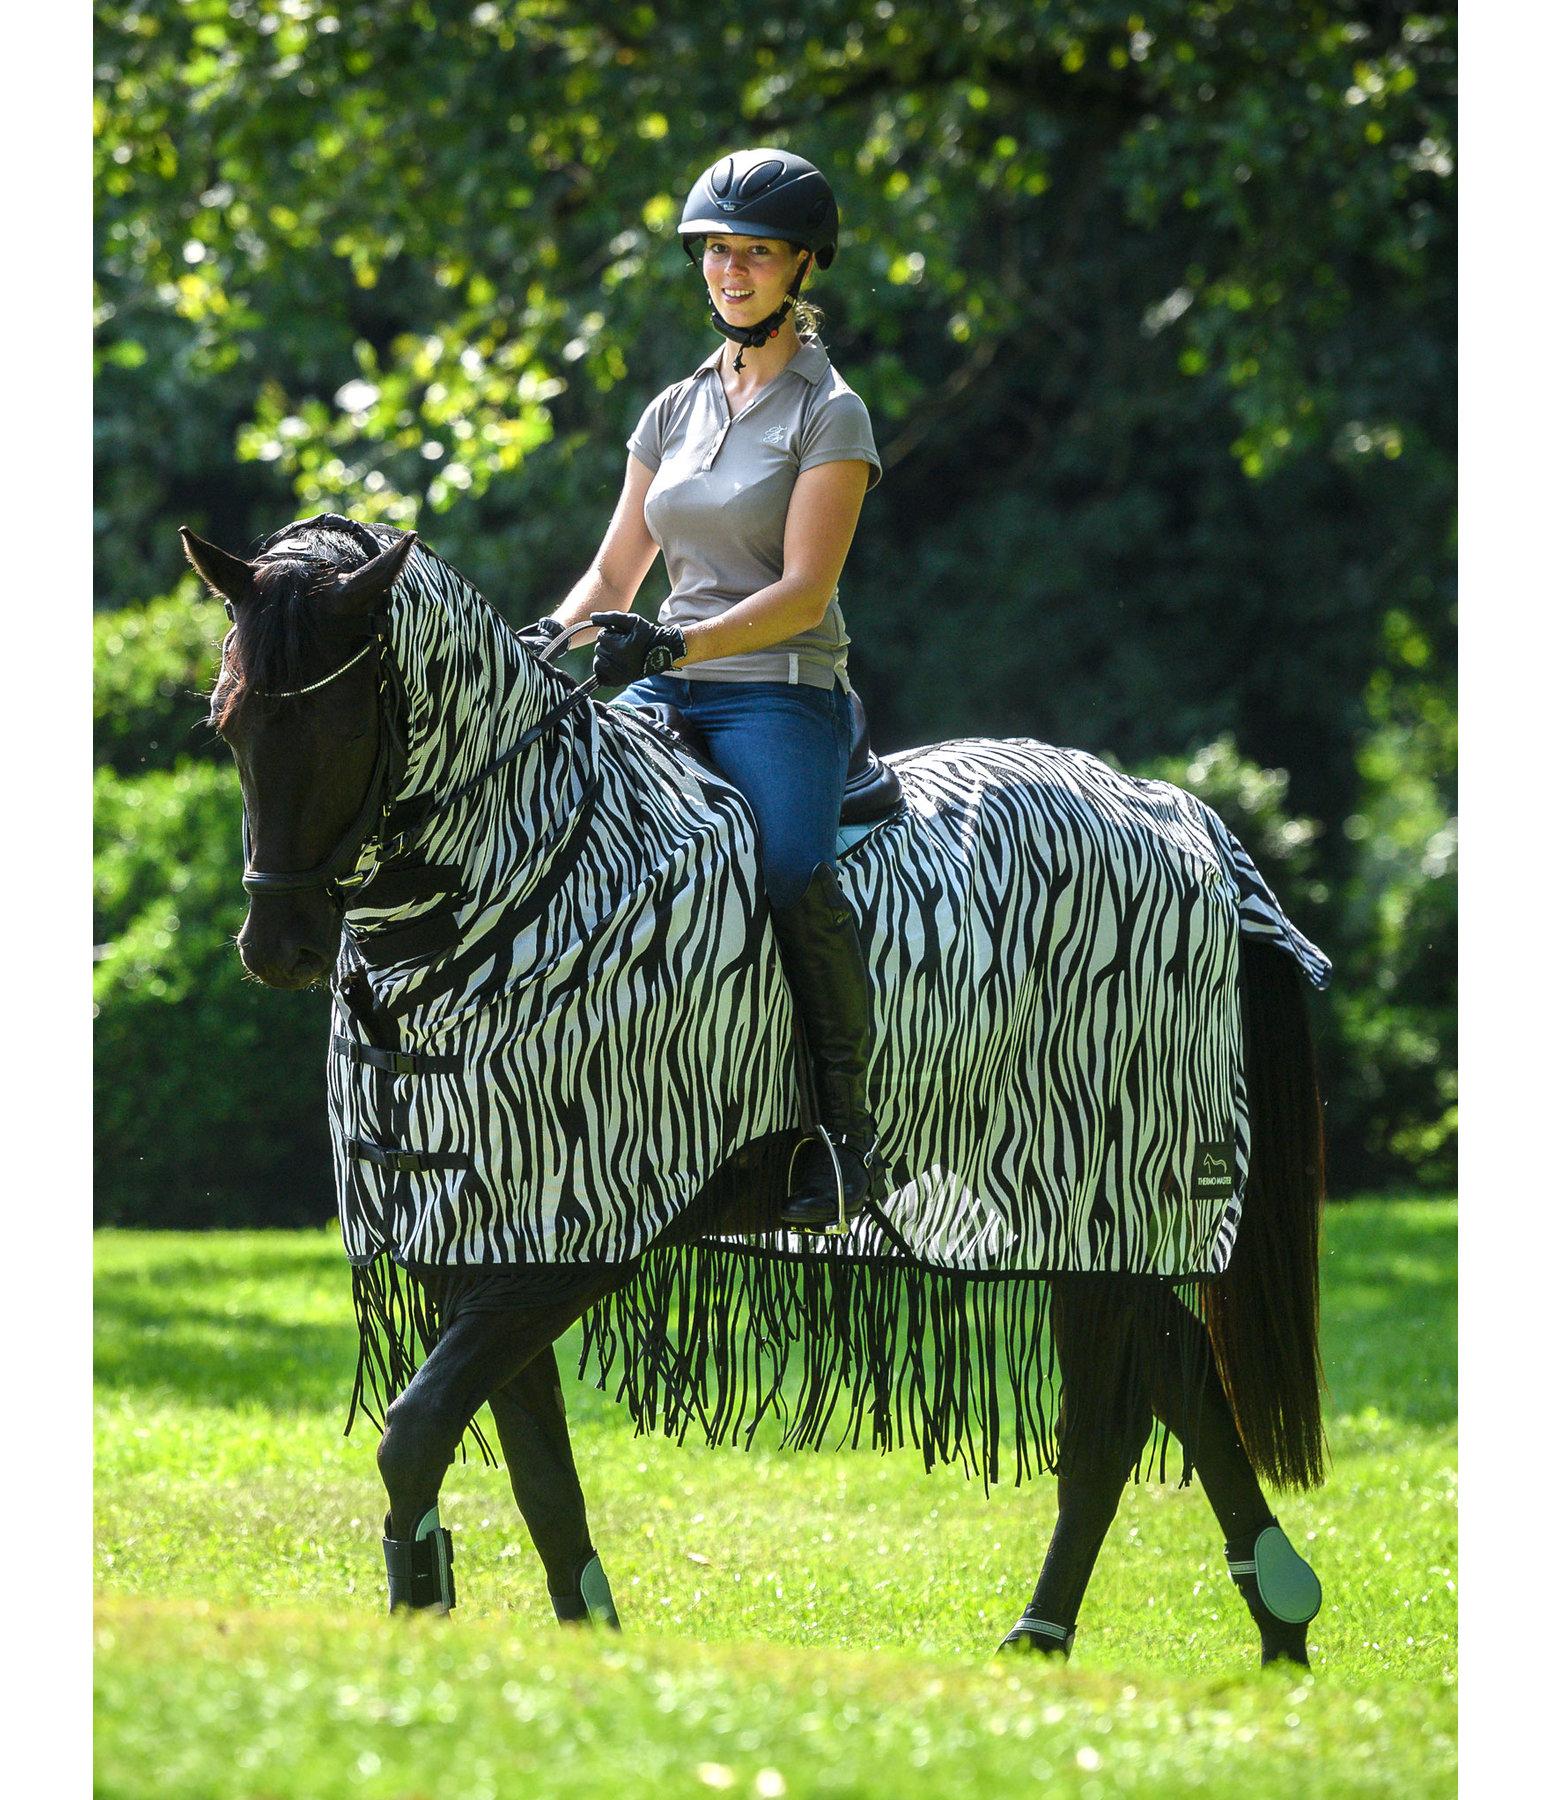 Zebra Fly Rug Uk: Zebra Fly Exercise Rug With Fringes